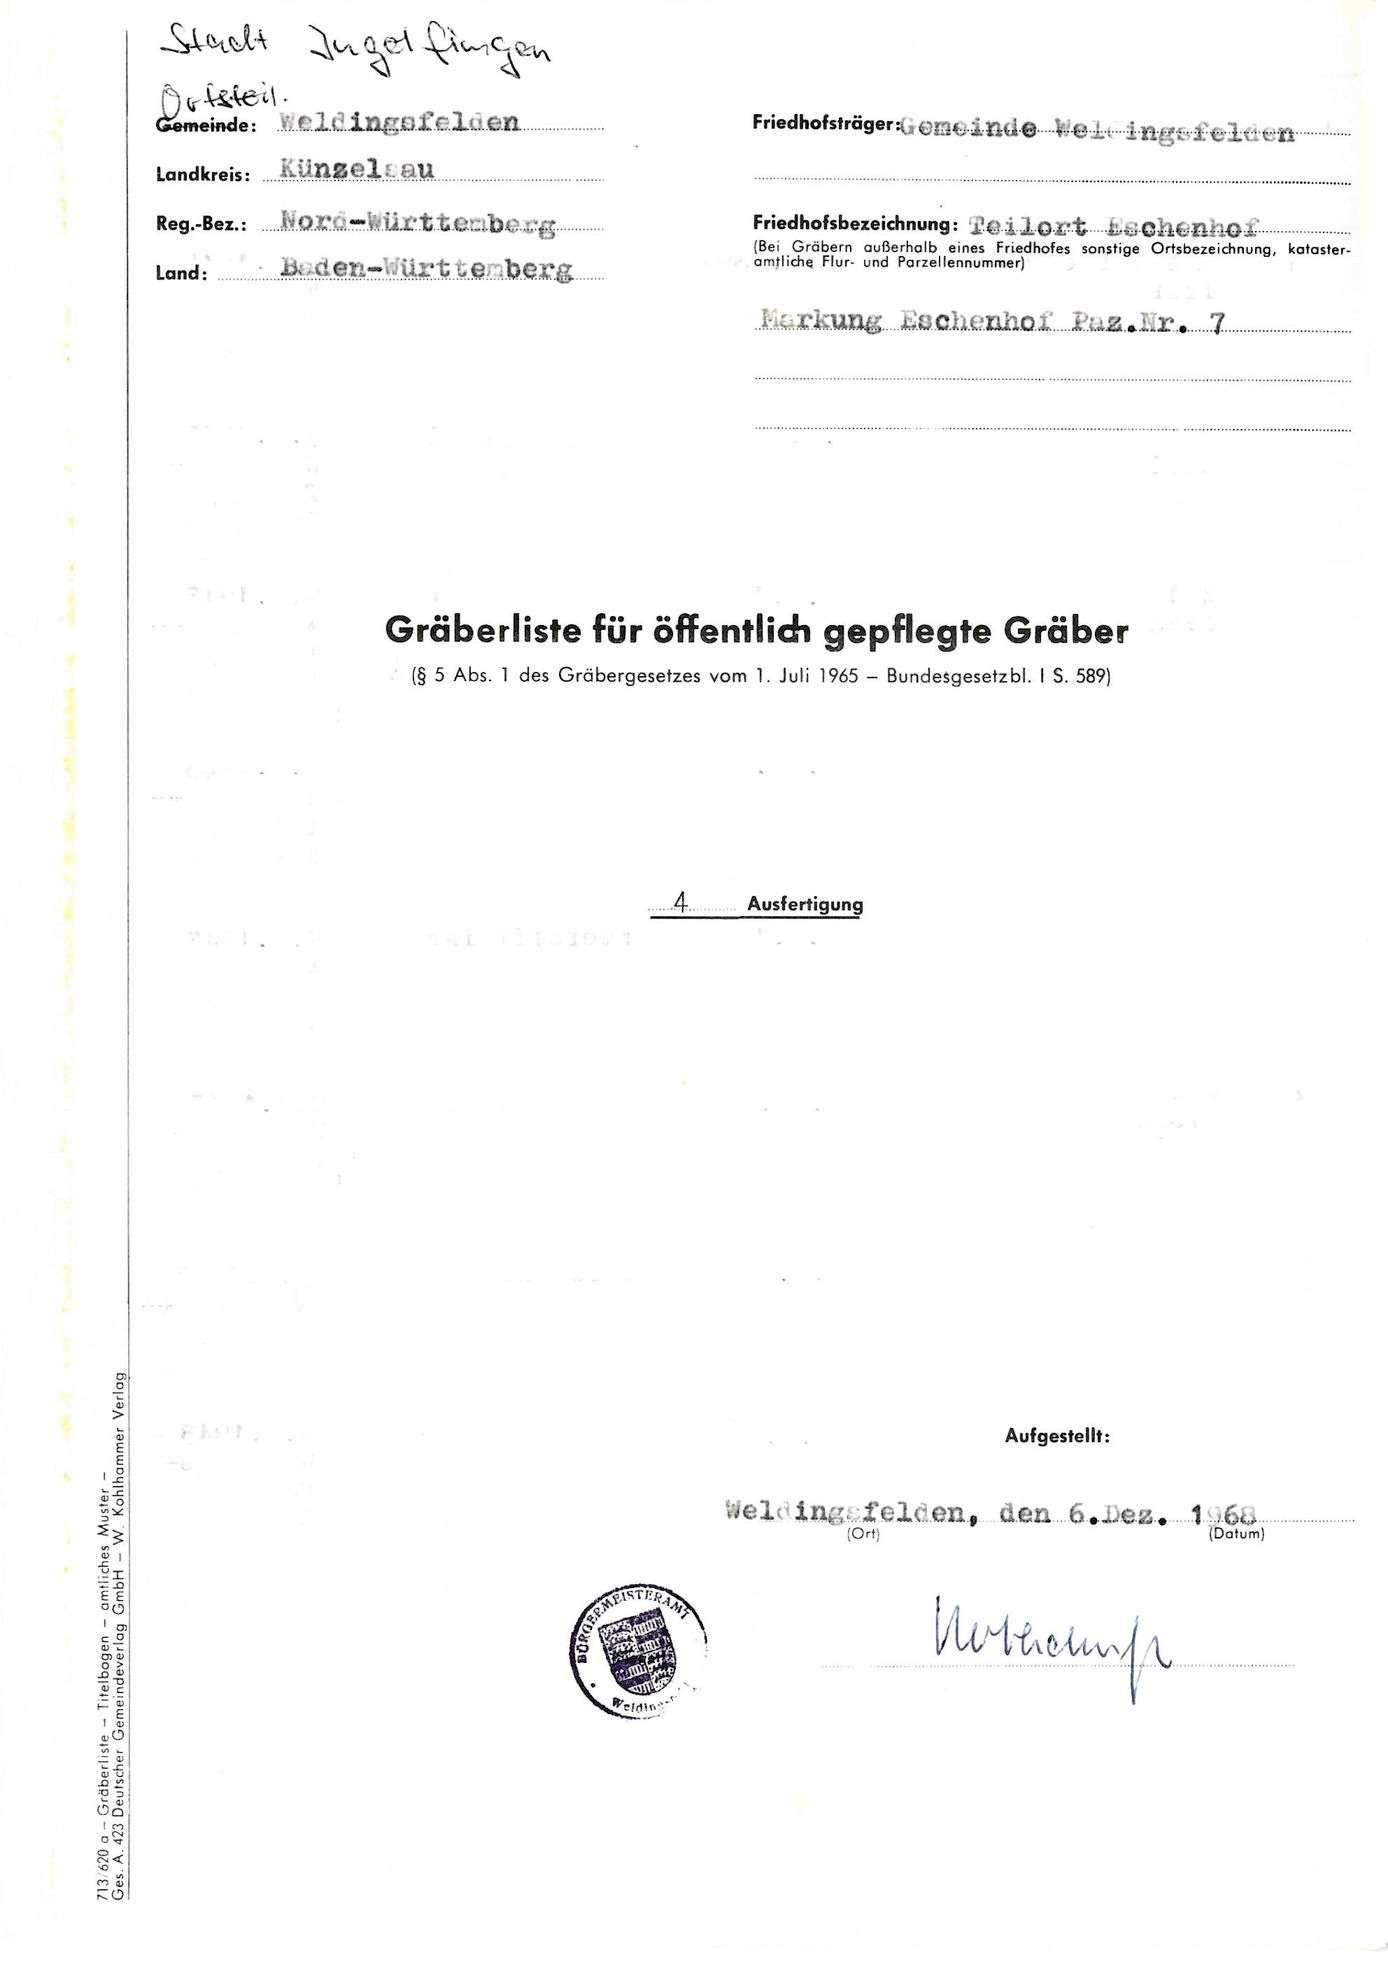 Weldingsfelden, Teilort Eschenhof, Bild 1